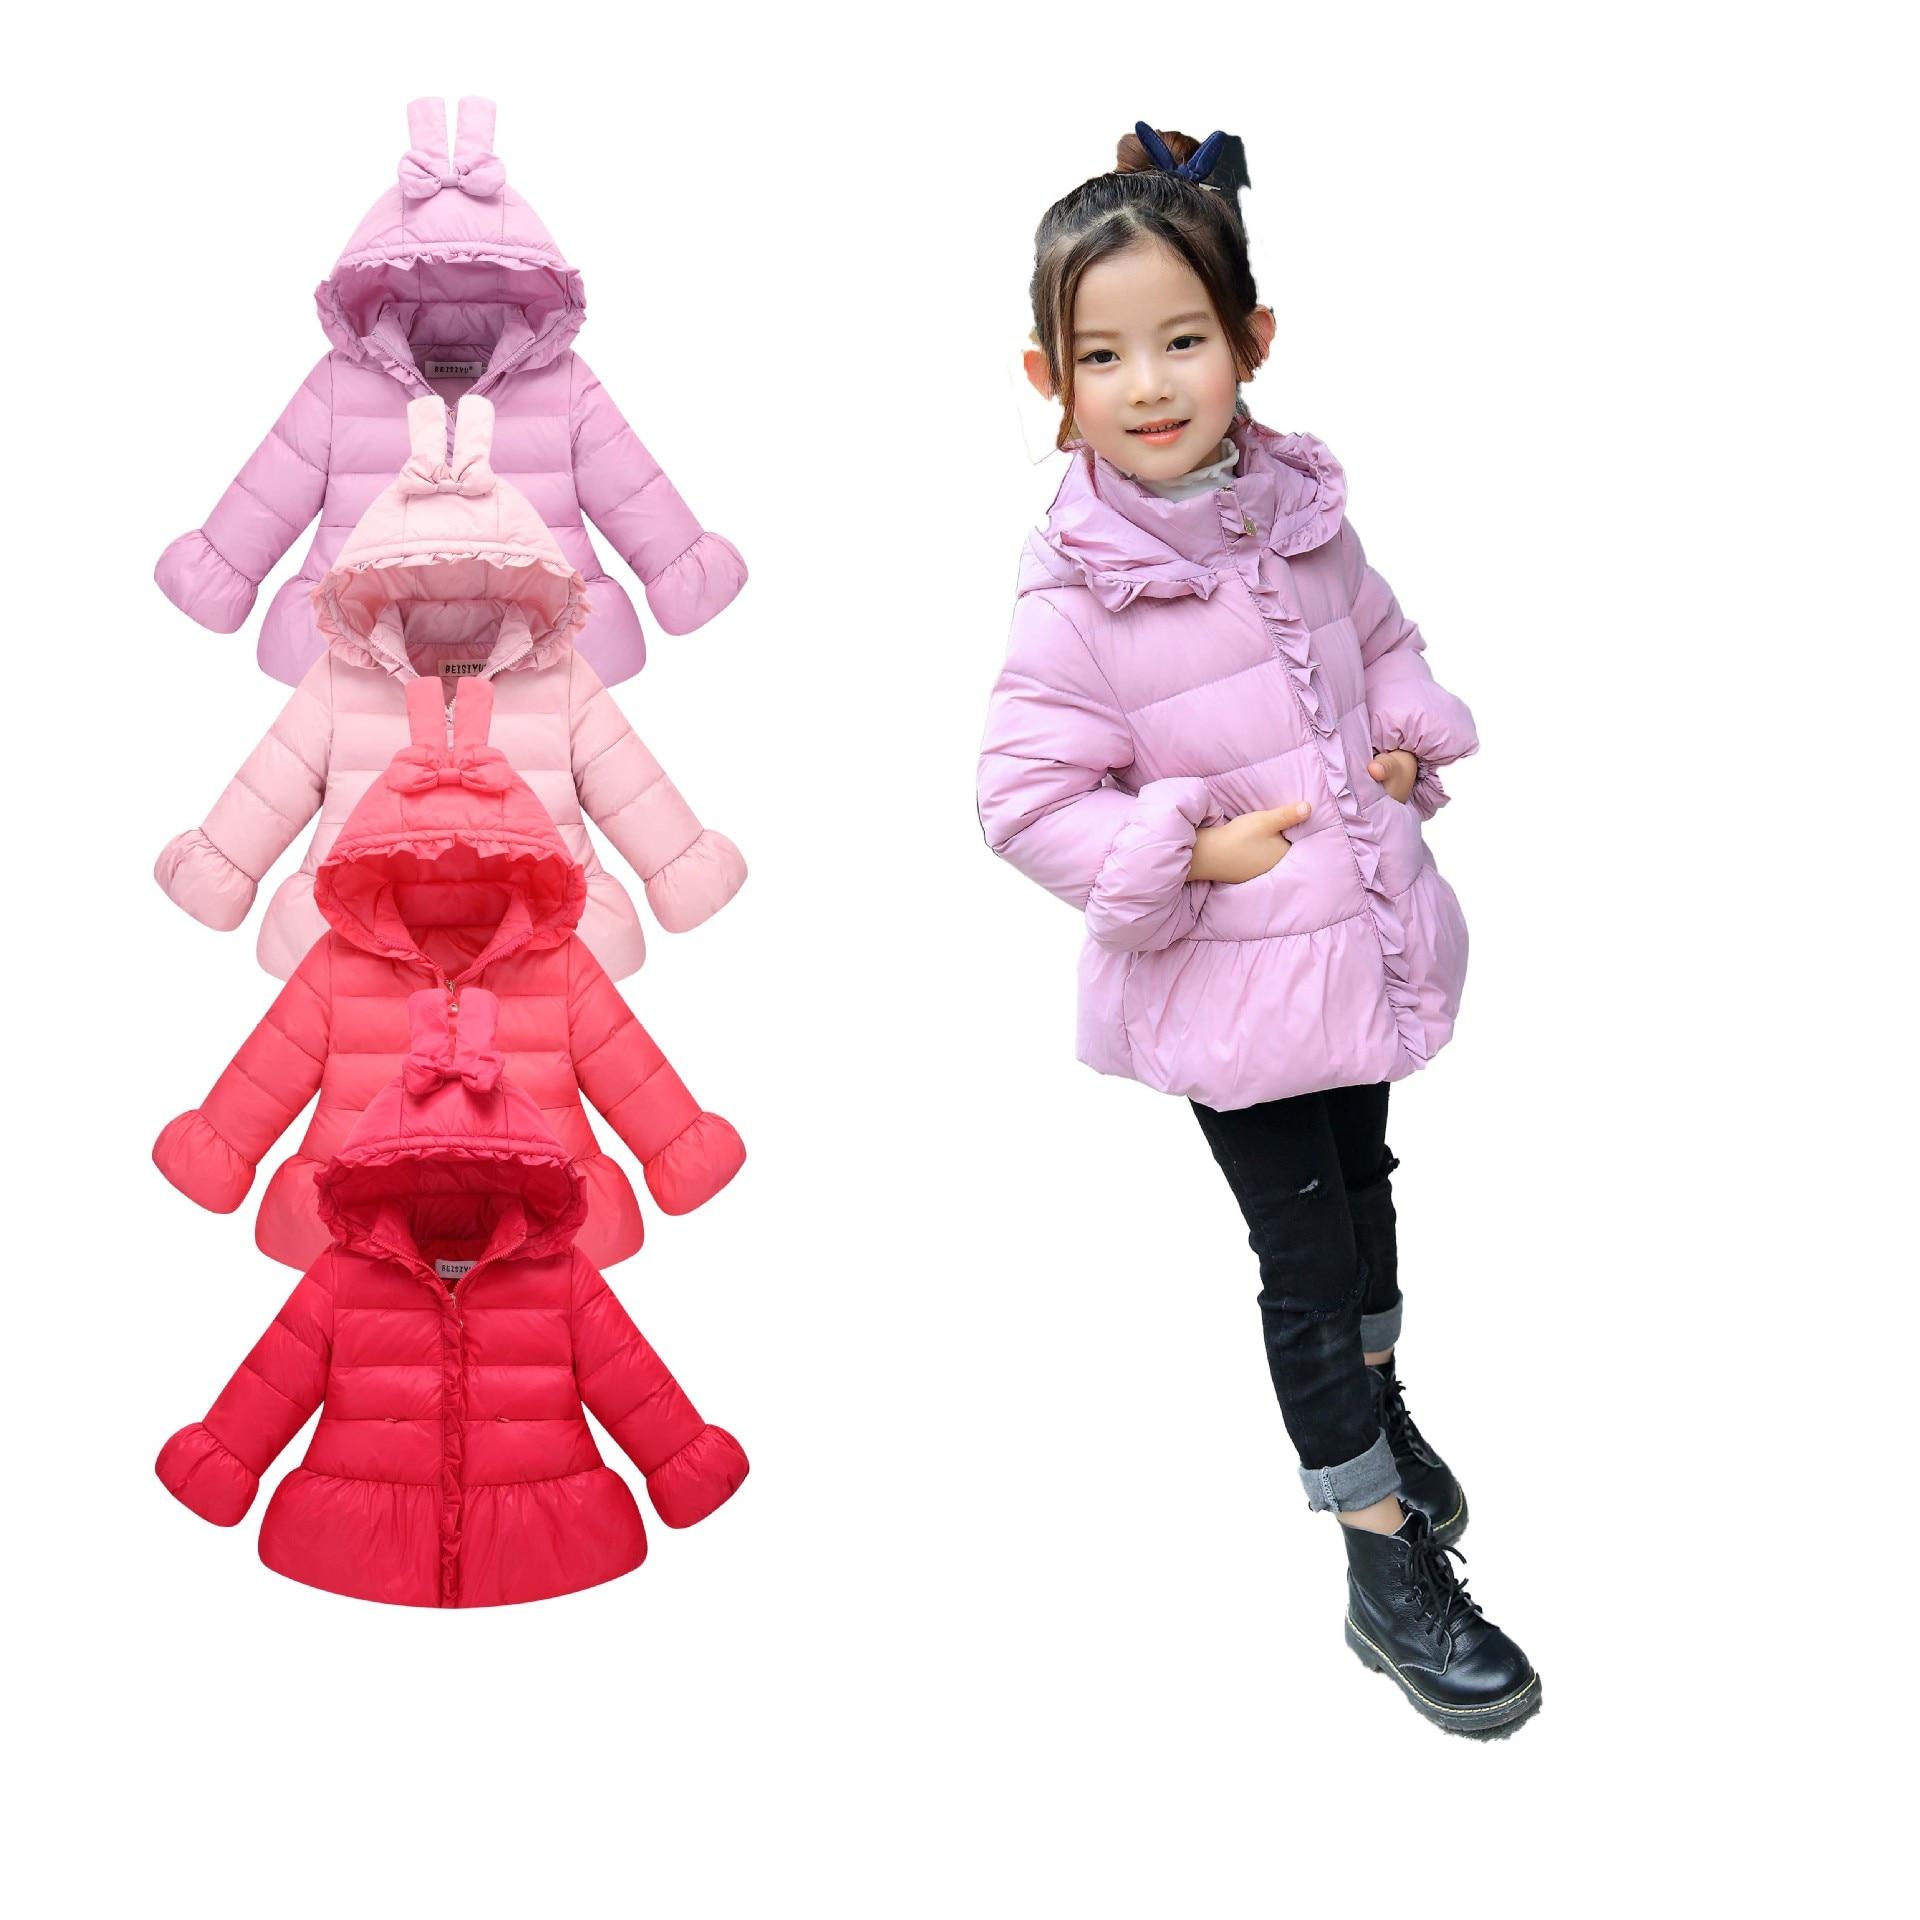 2017 Winter Boys Girls Sets Kids Cotton-Padded Coat Clothing Suit Children Cashmere Warm Baby rabbit ears Creative coat girls<br>